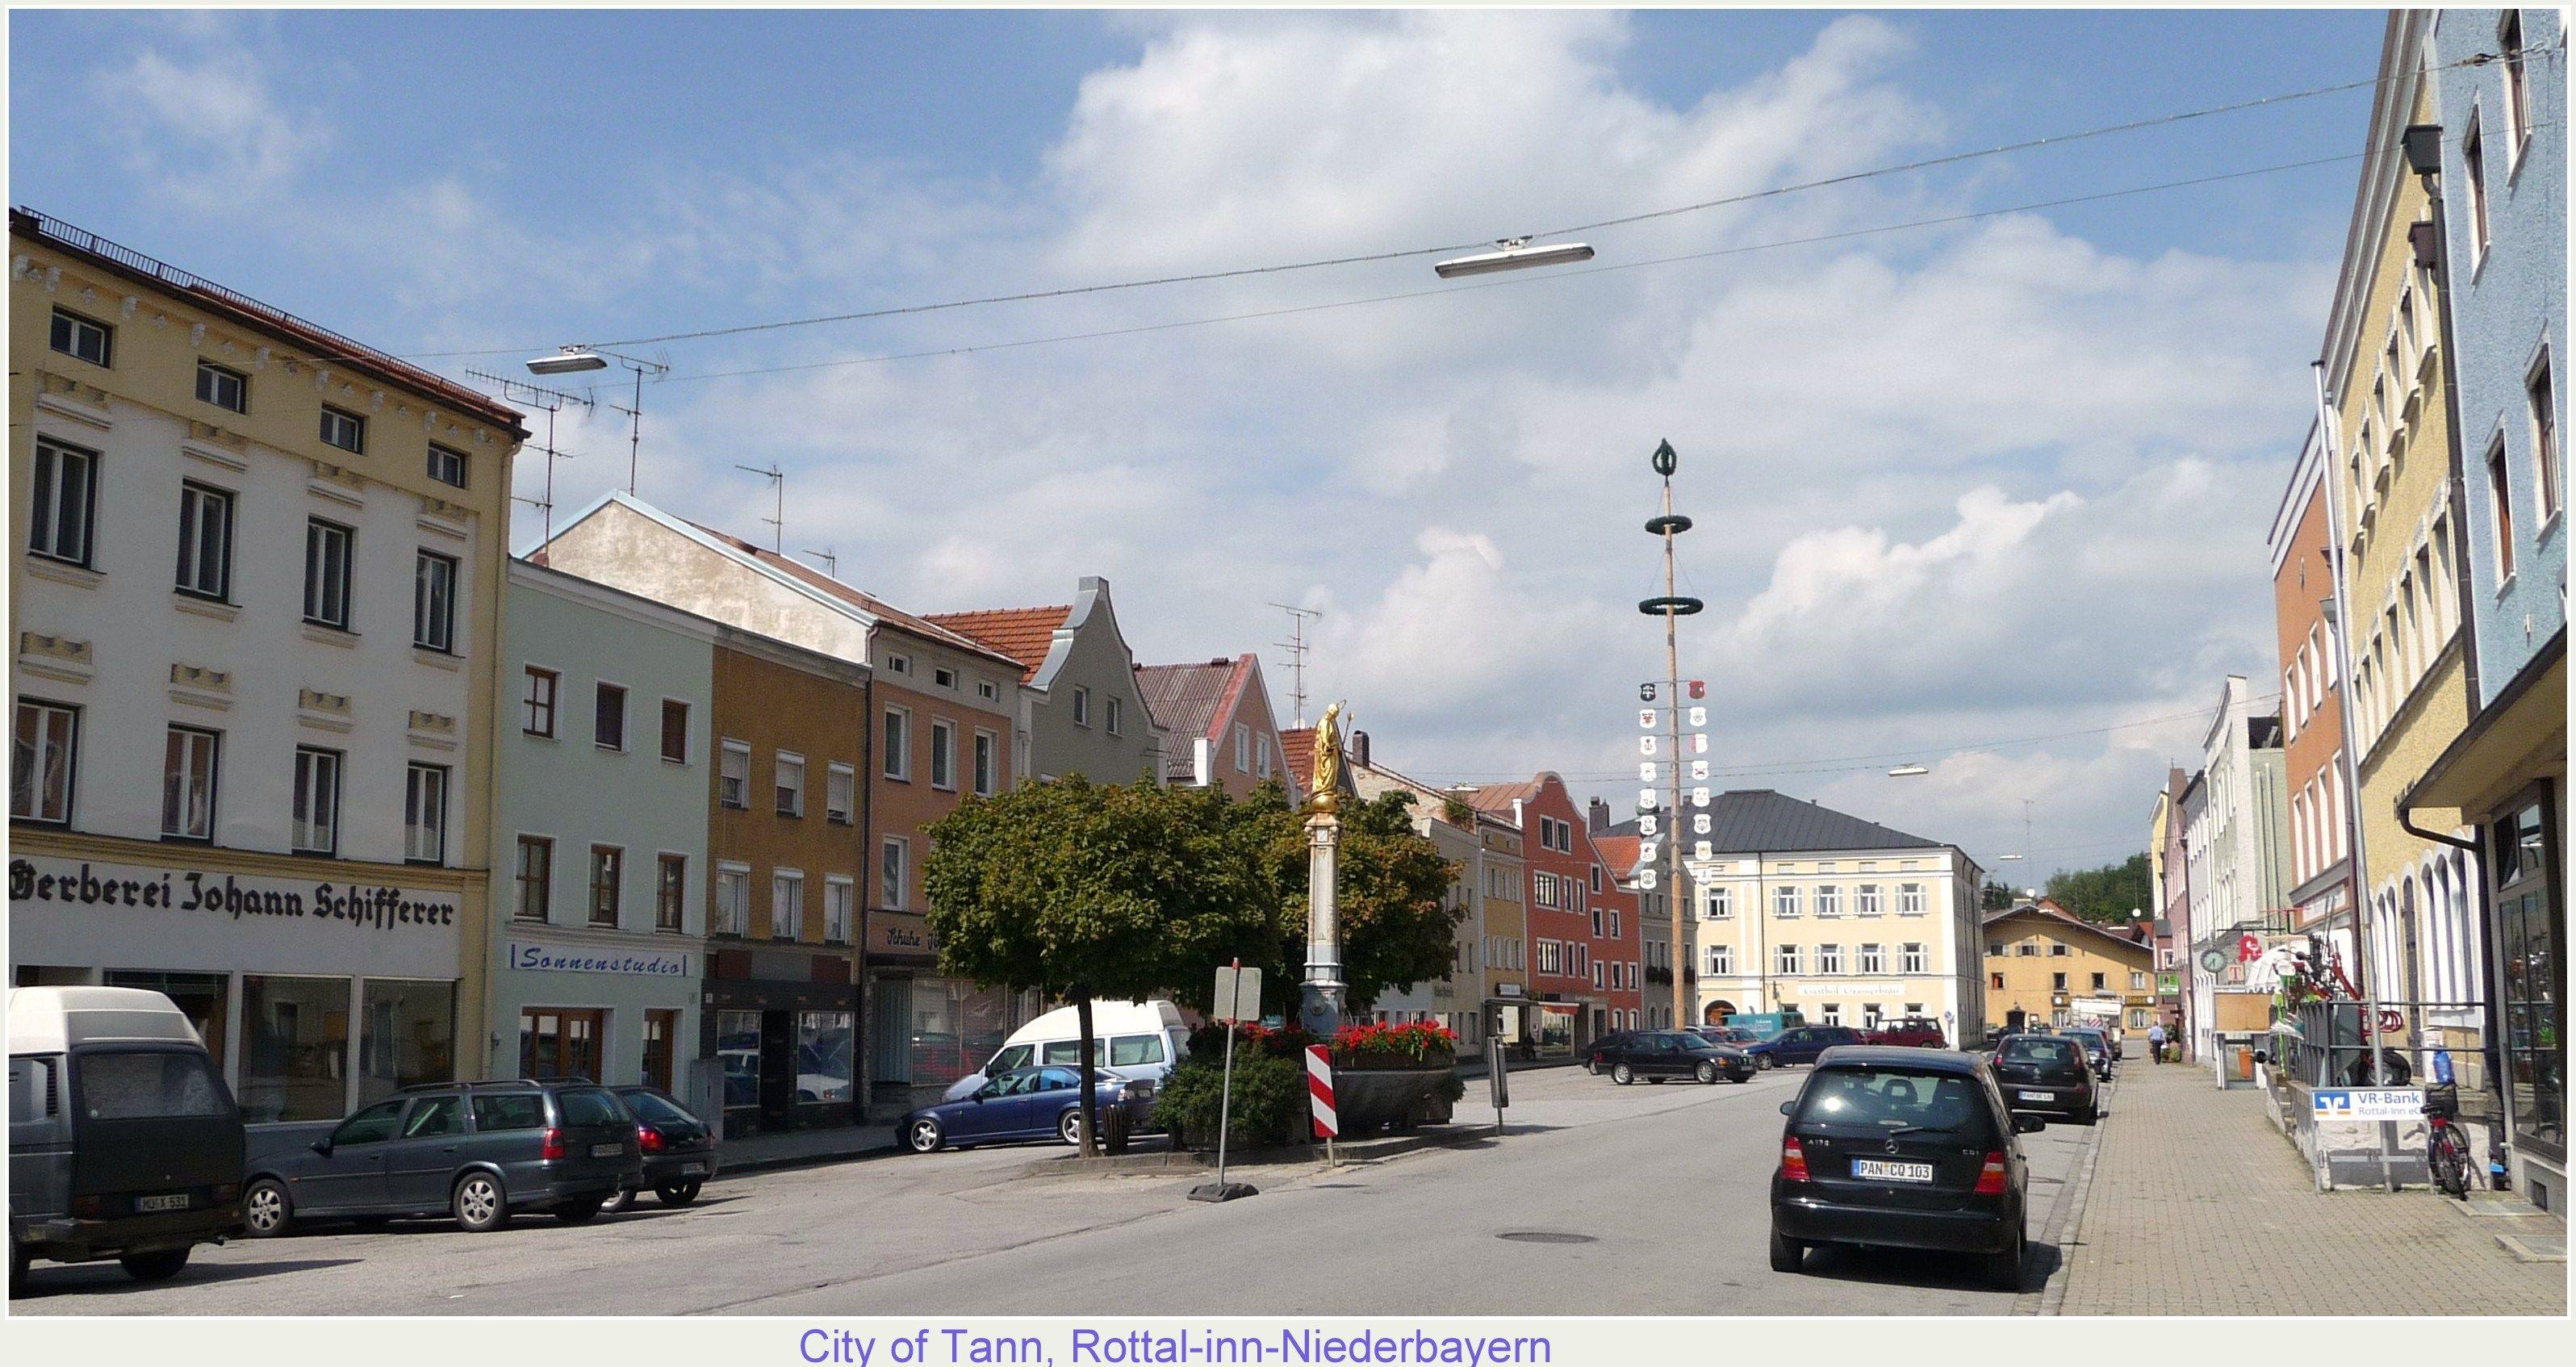 City Of Tann In Rottal Inn In Niederbayern Tann Lower City